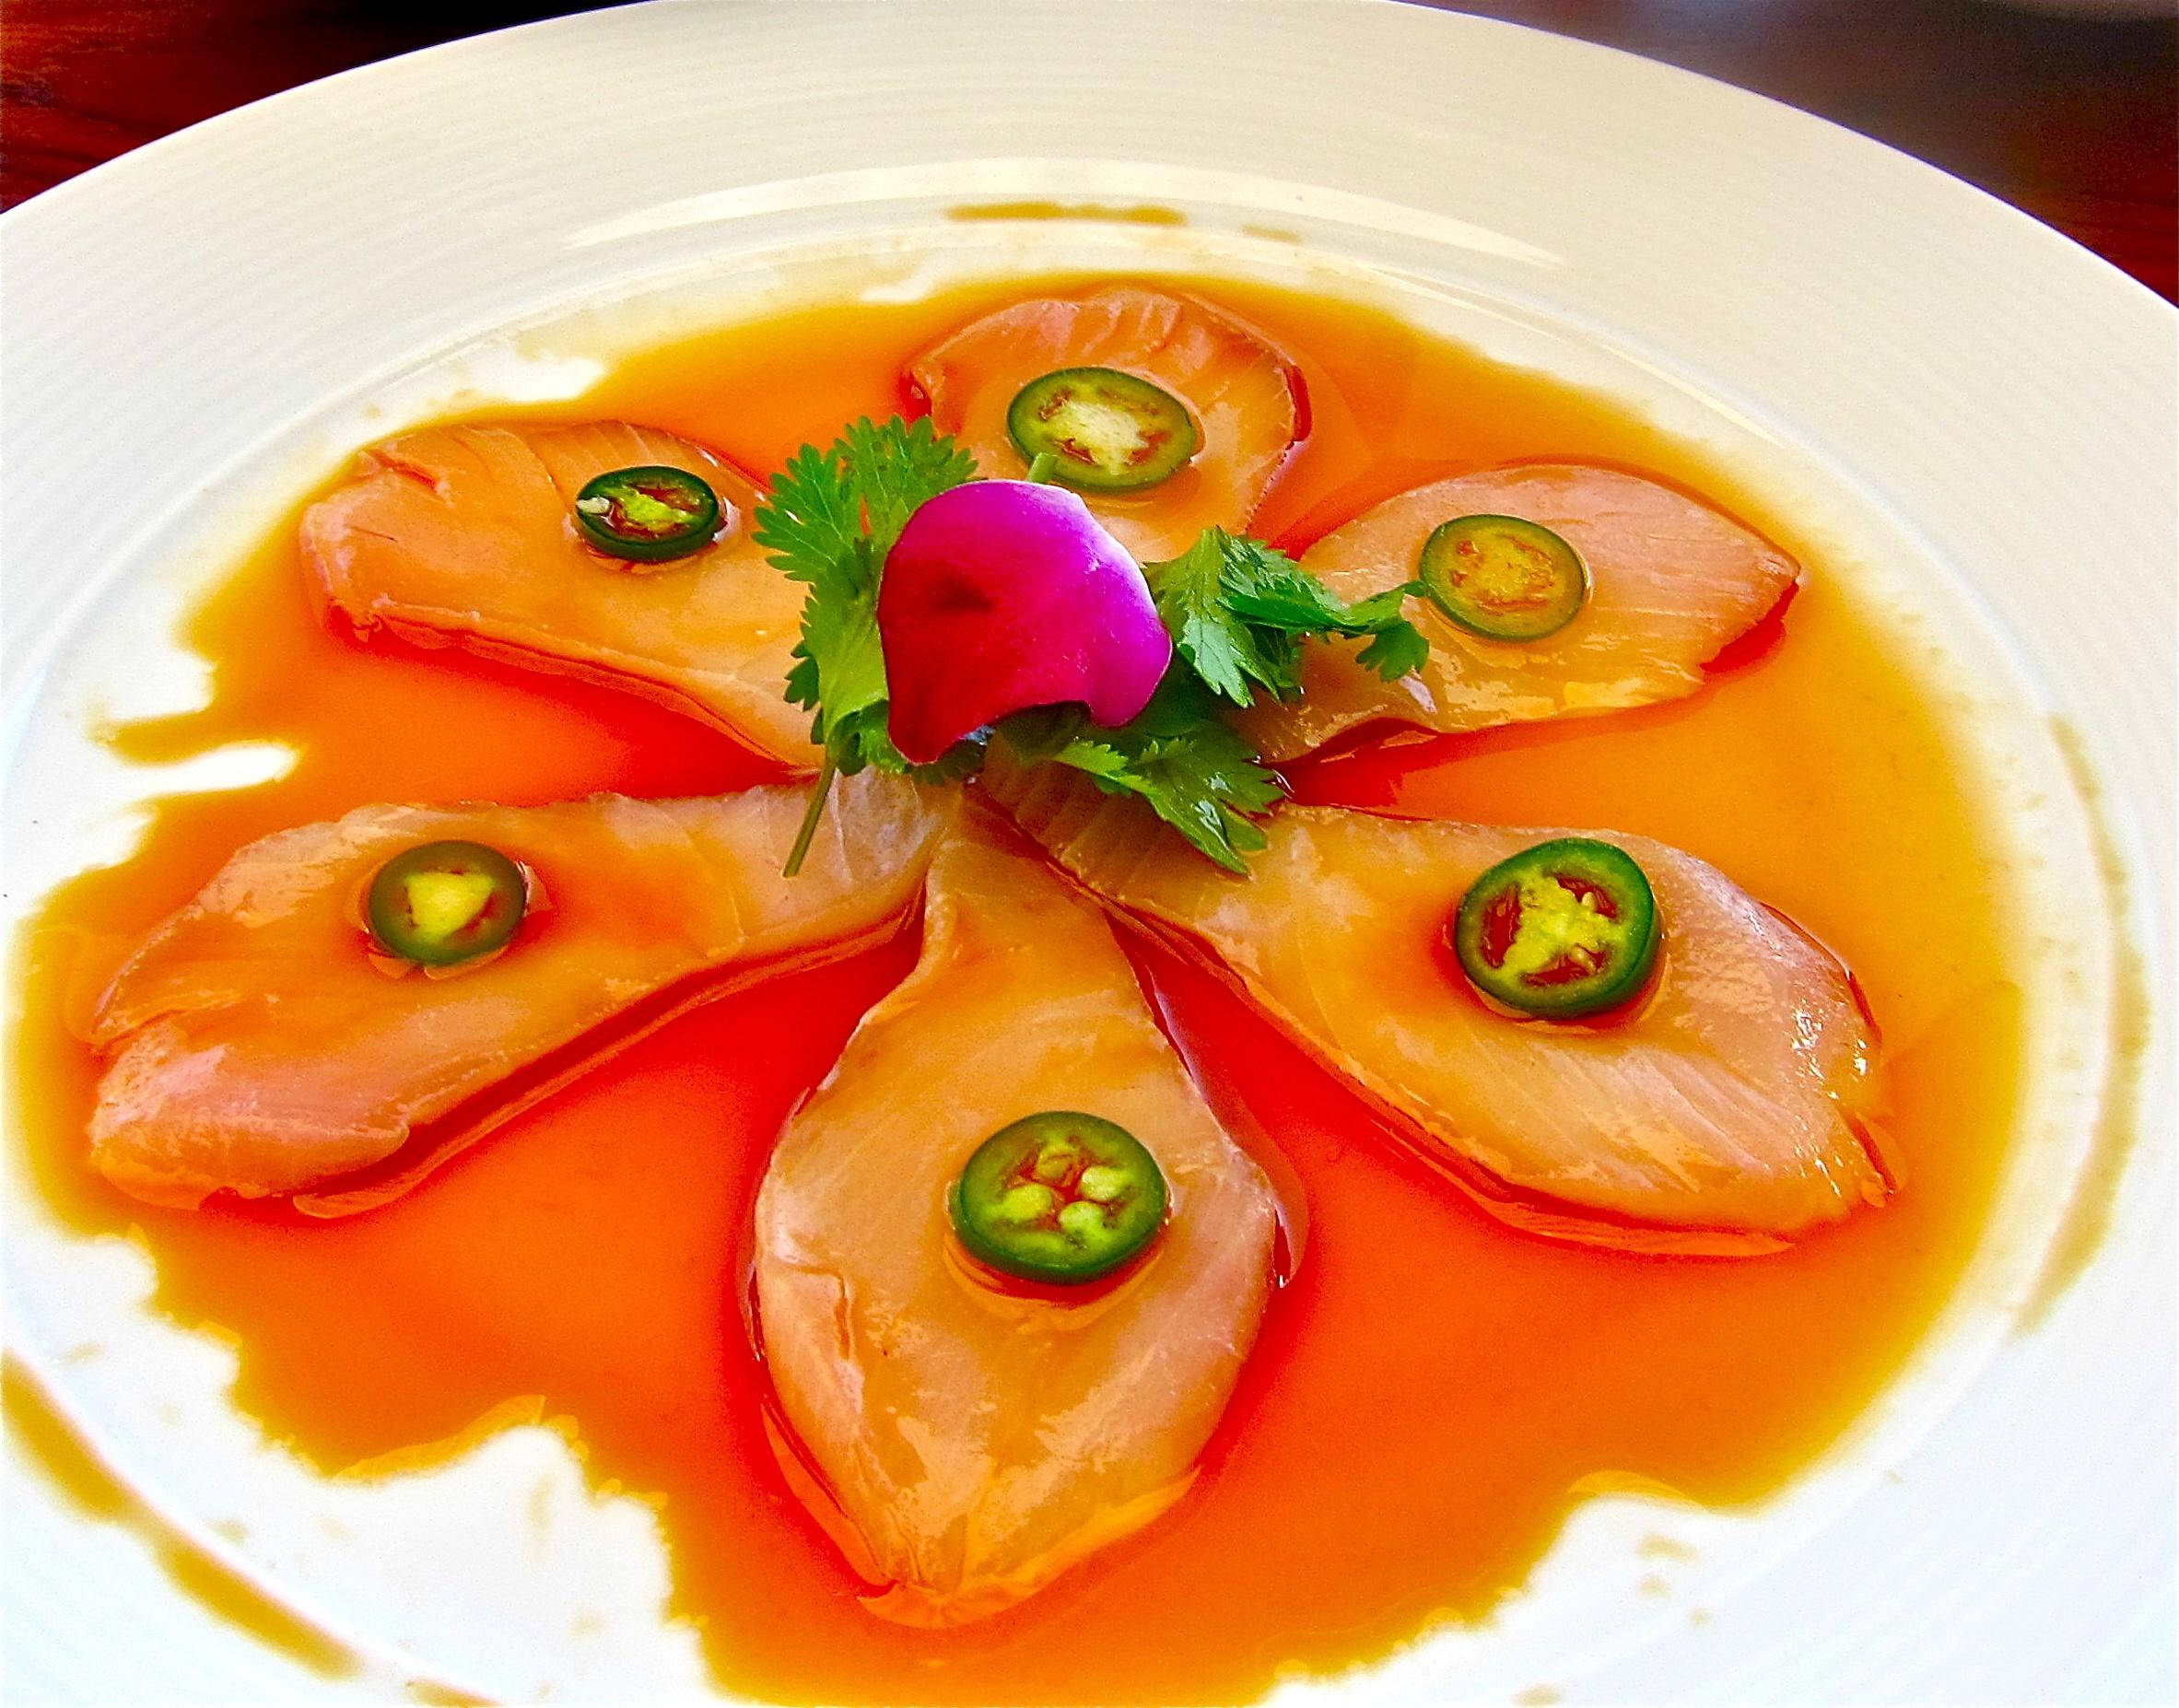 NOBU MALIBU May Be Hottest, Most Exciting New Restaurant ...